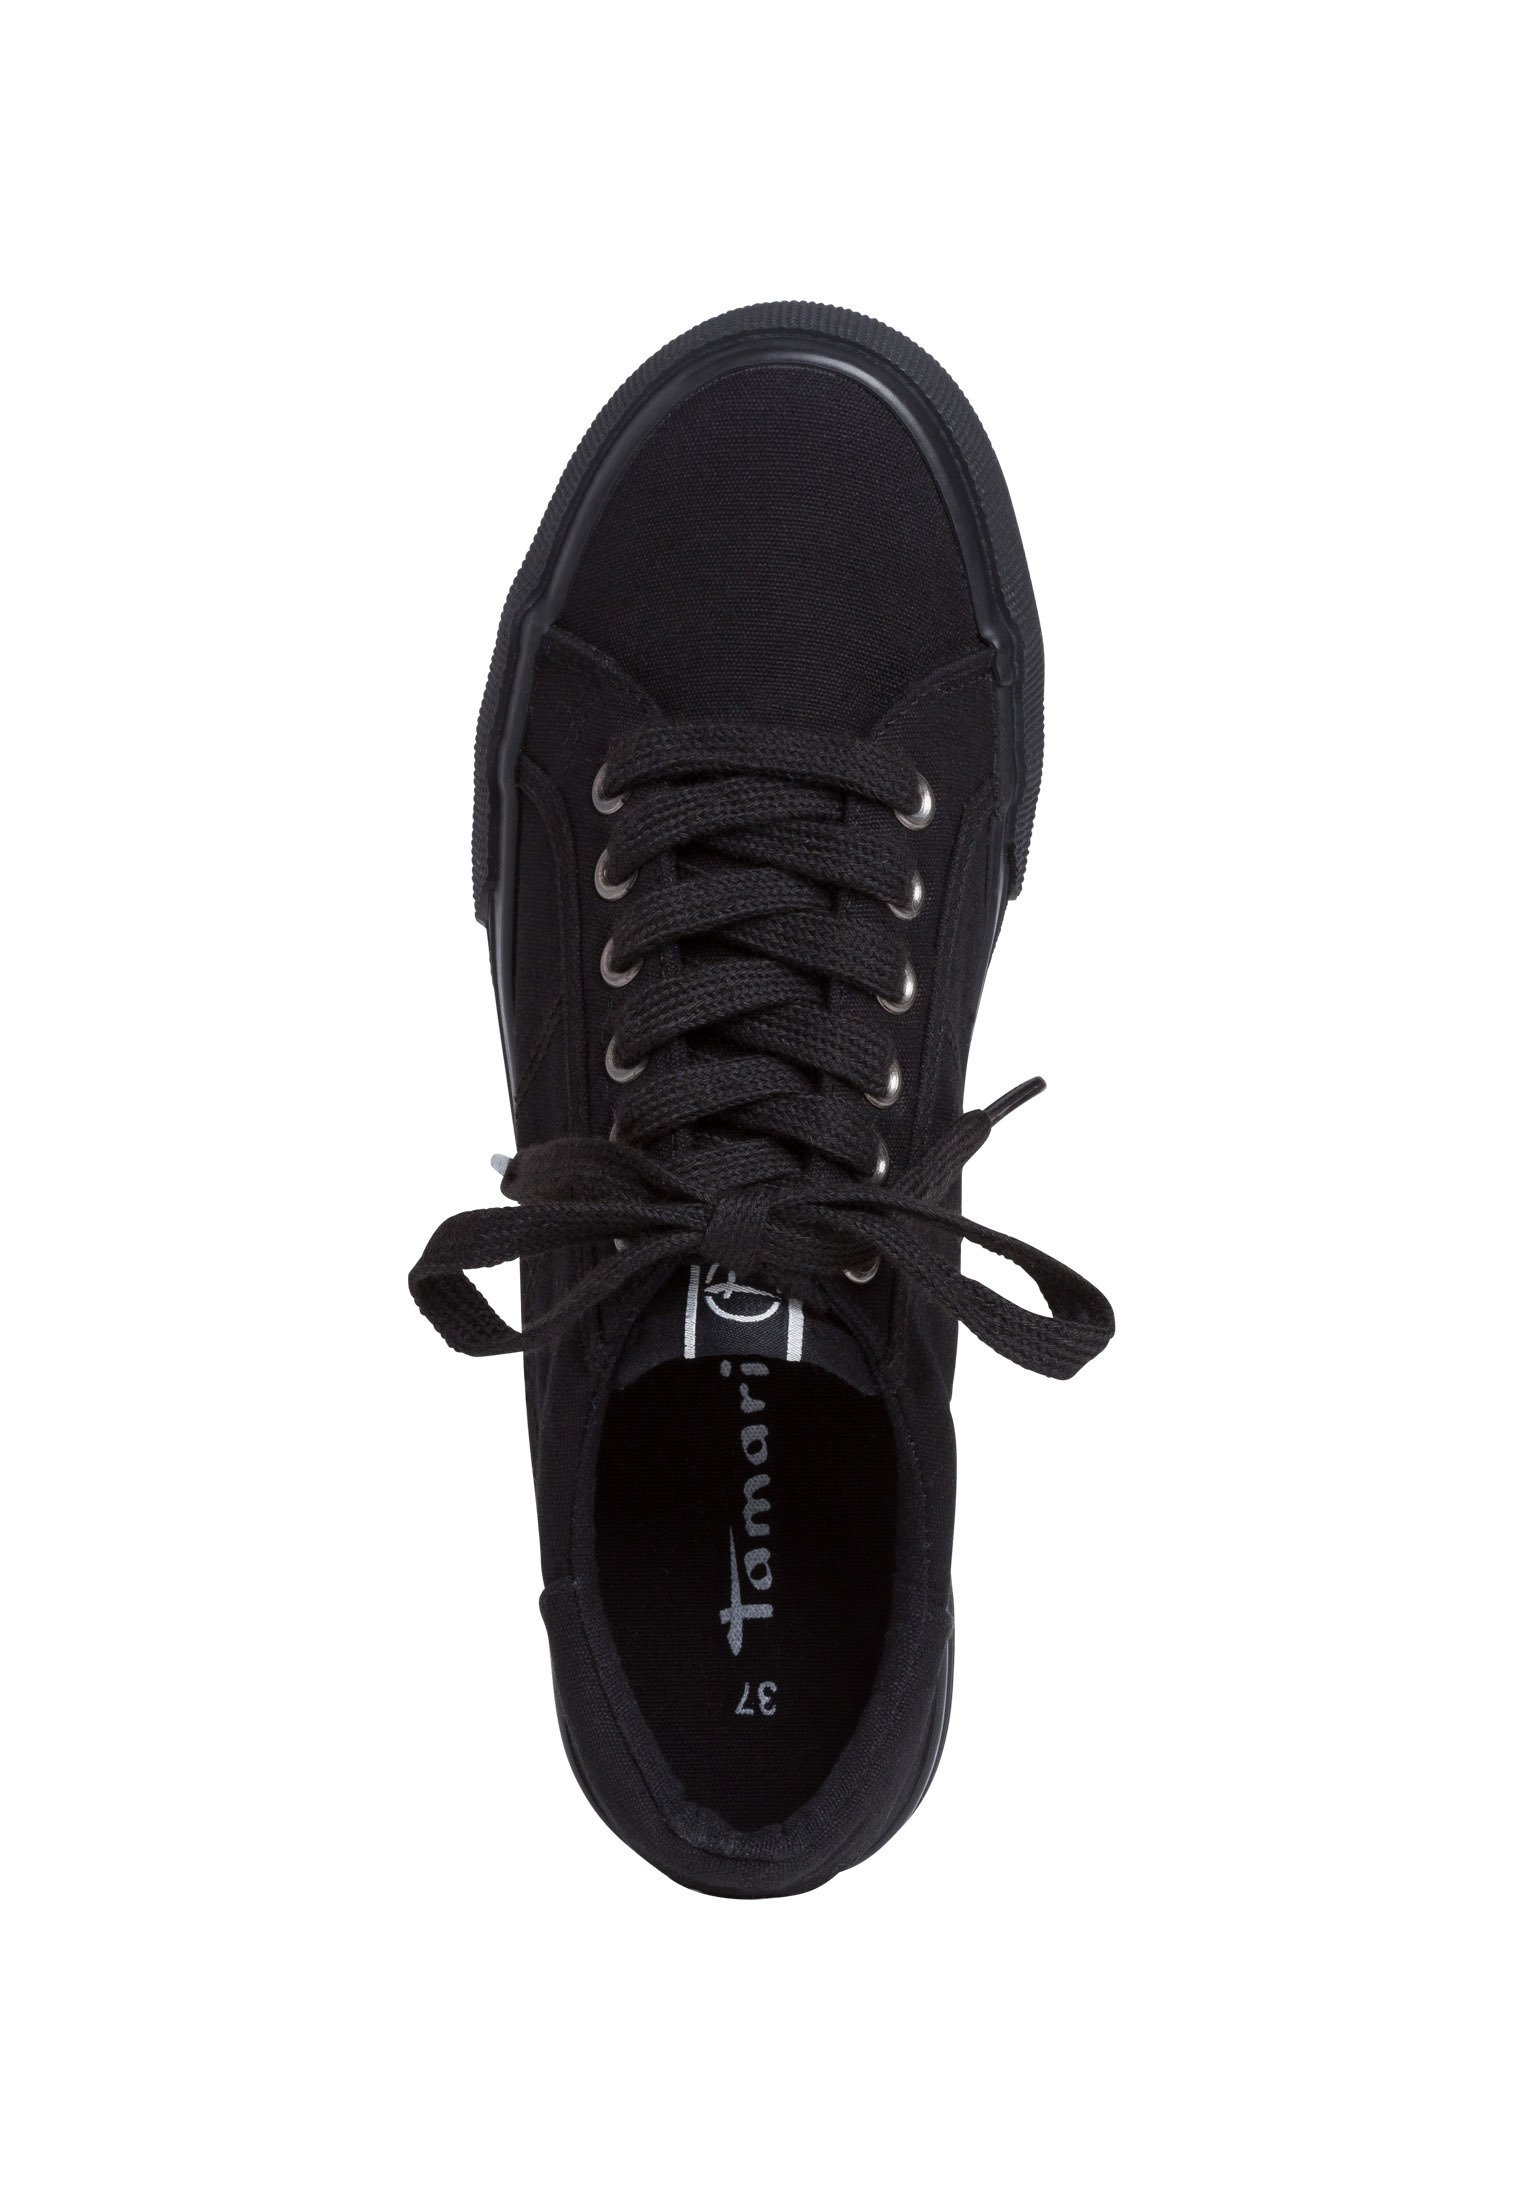 Tamaris Lace-up - Sneakers Black